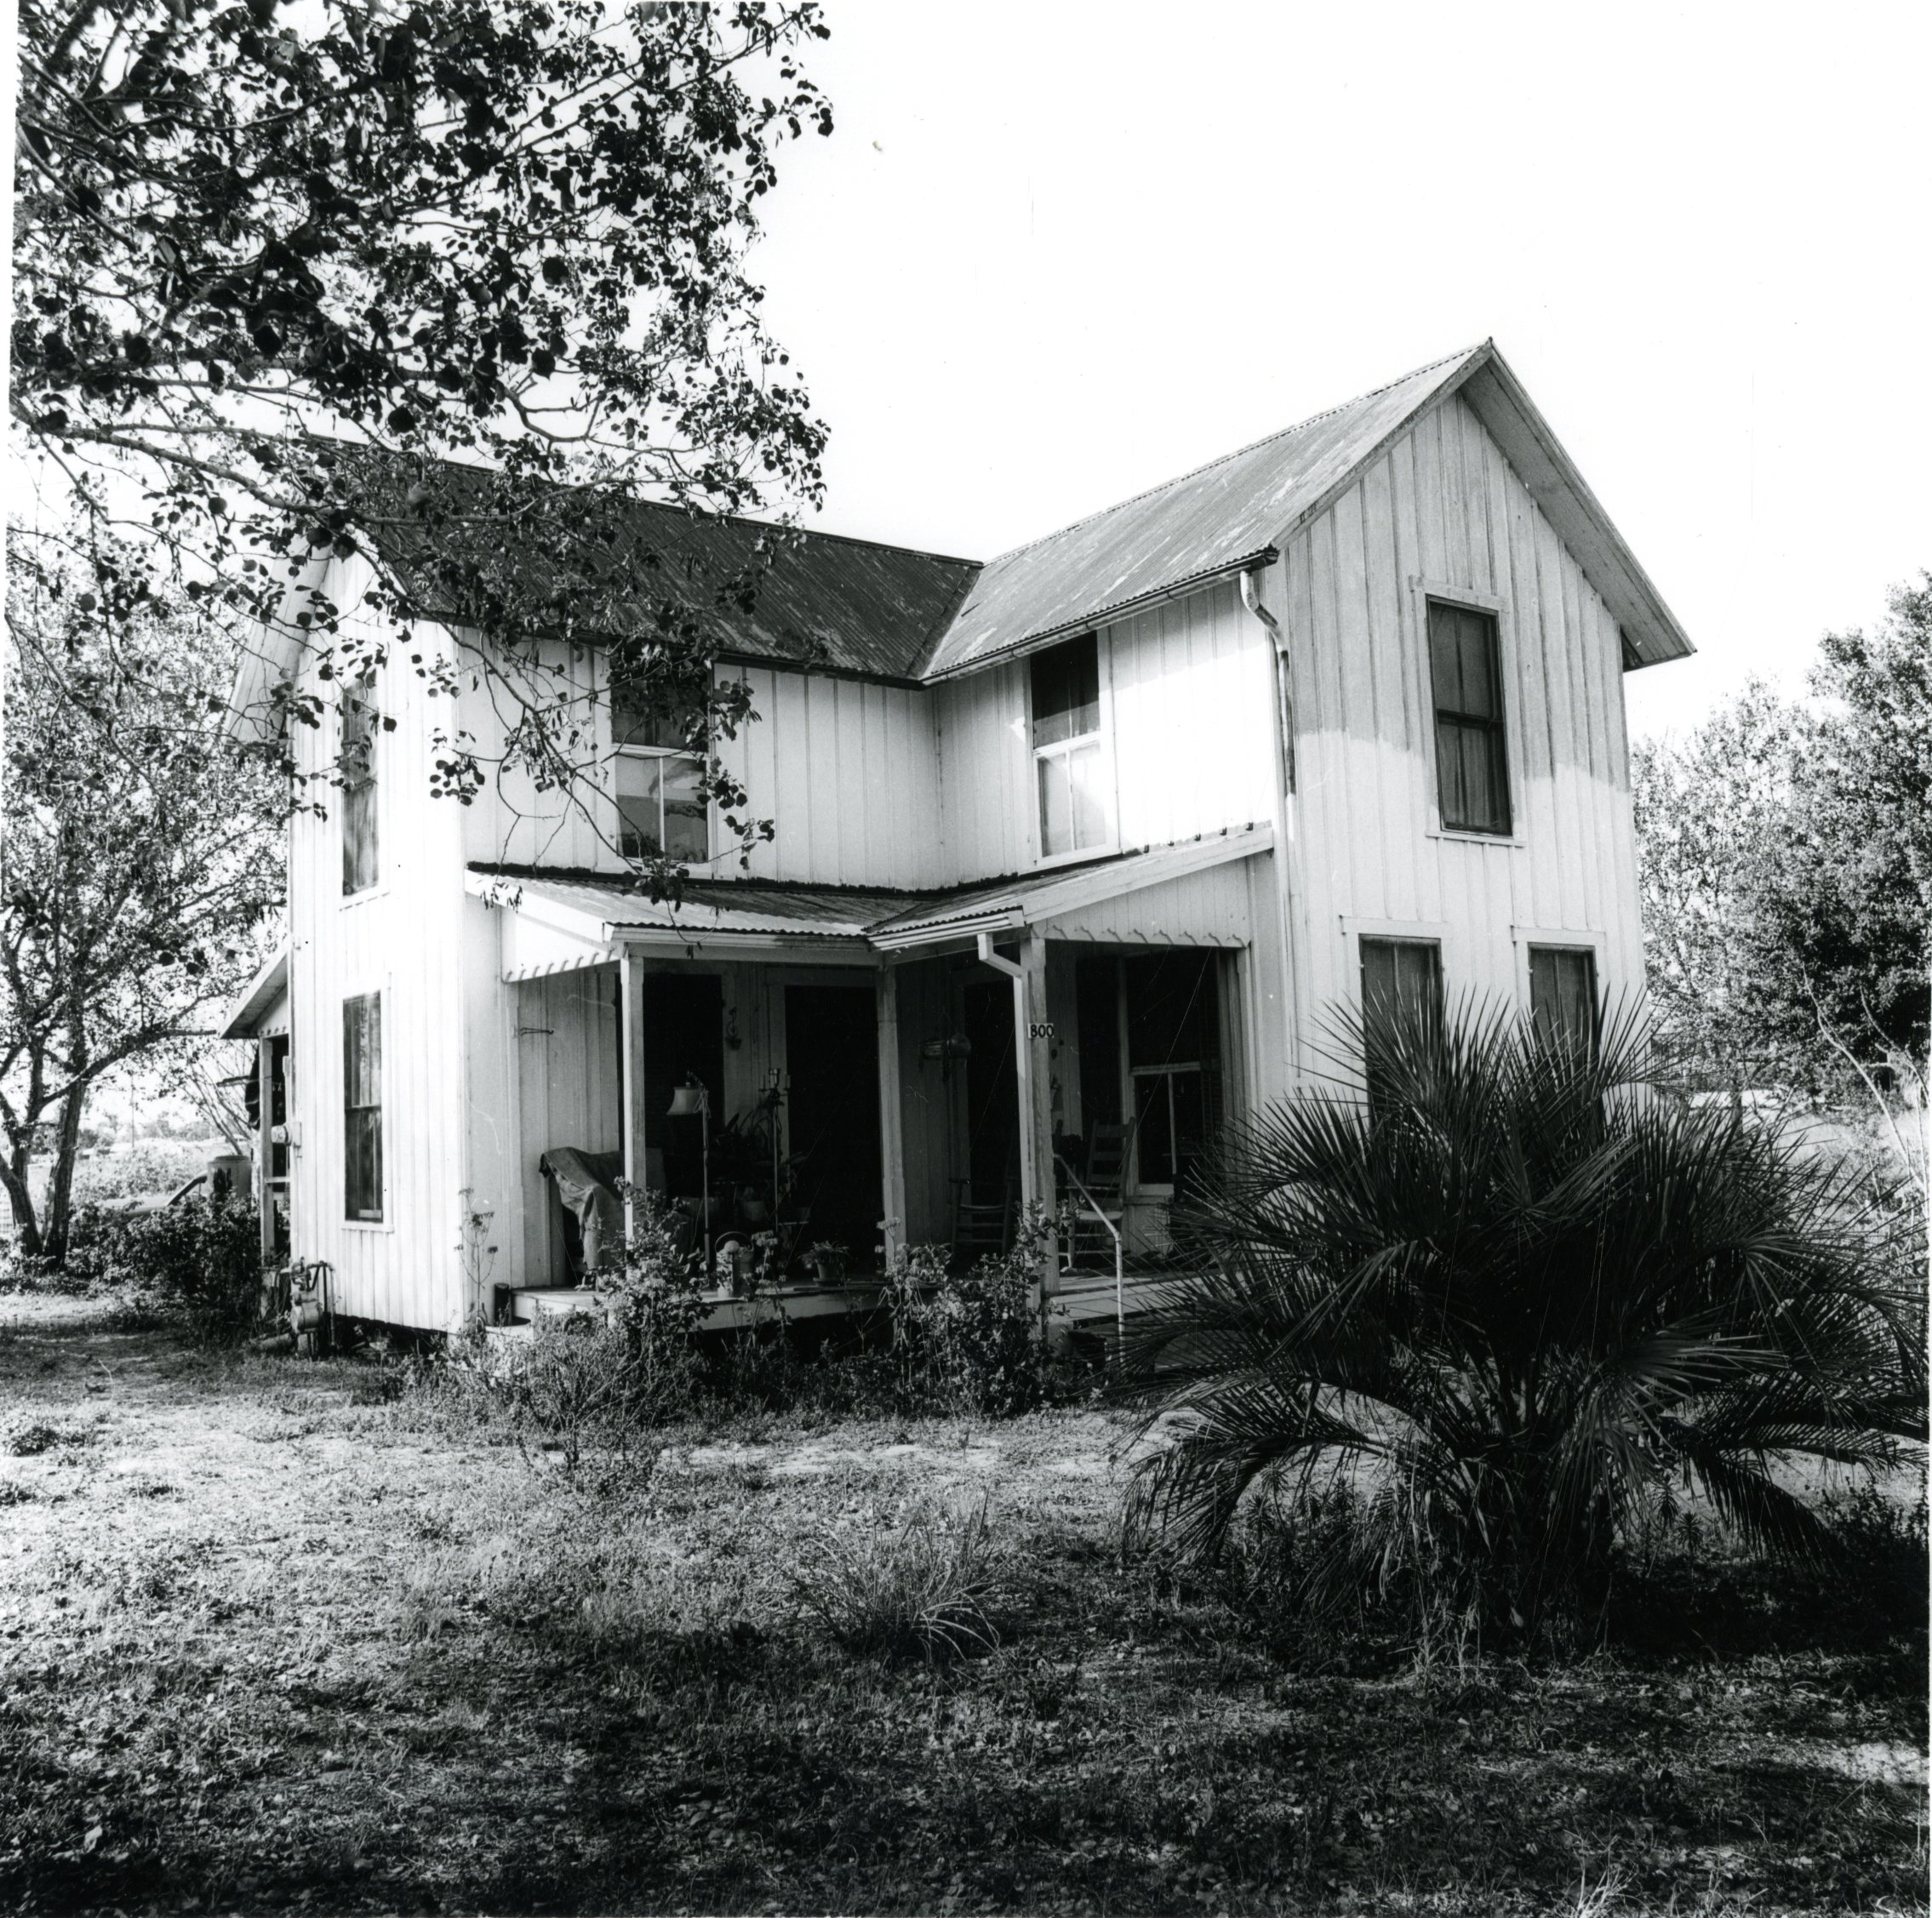 Lowe House on original site, Anona, Florida, circa 1930.